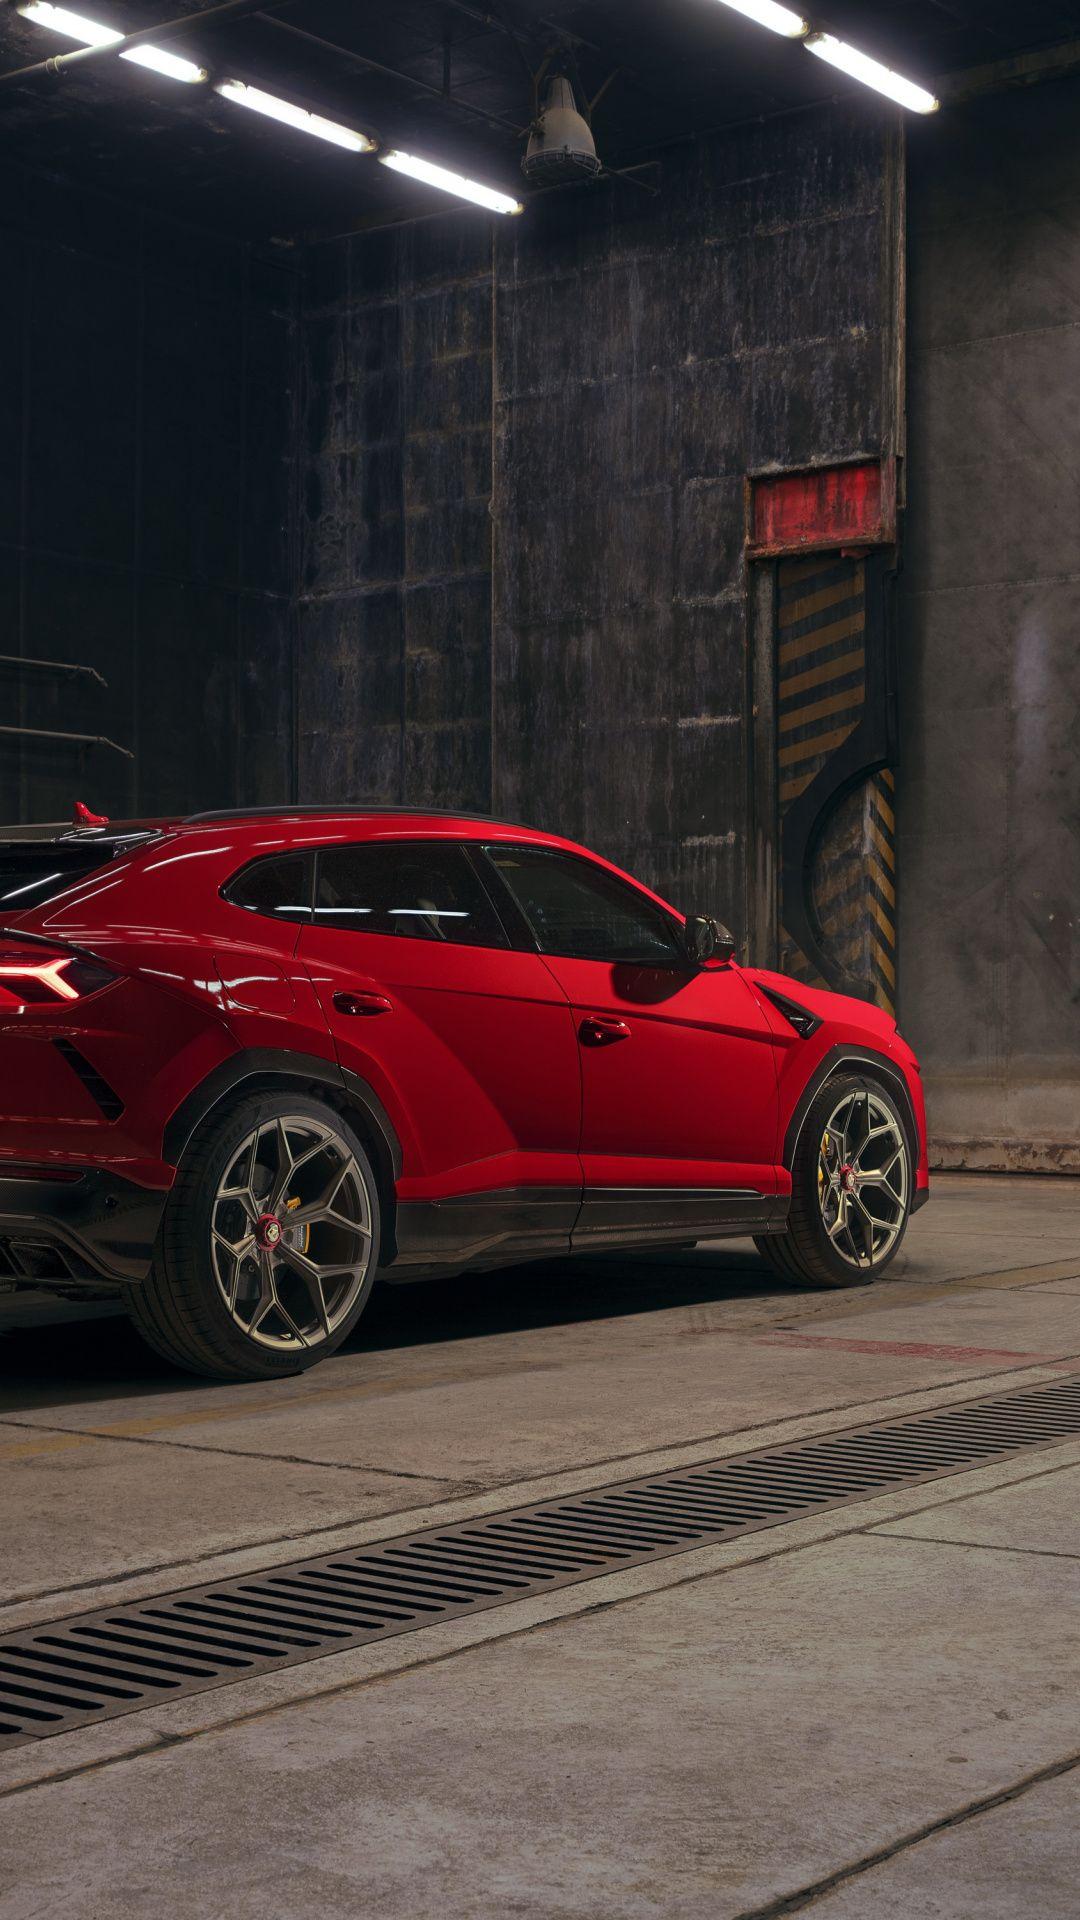 1080x1920 2019, red car, Urus wallpaper Red